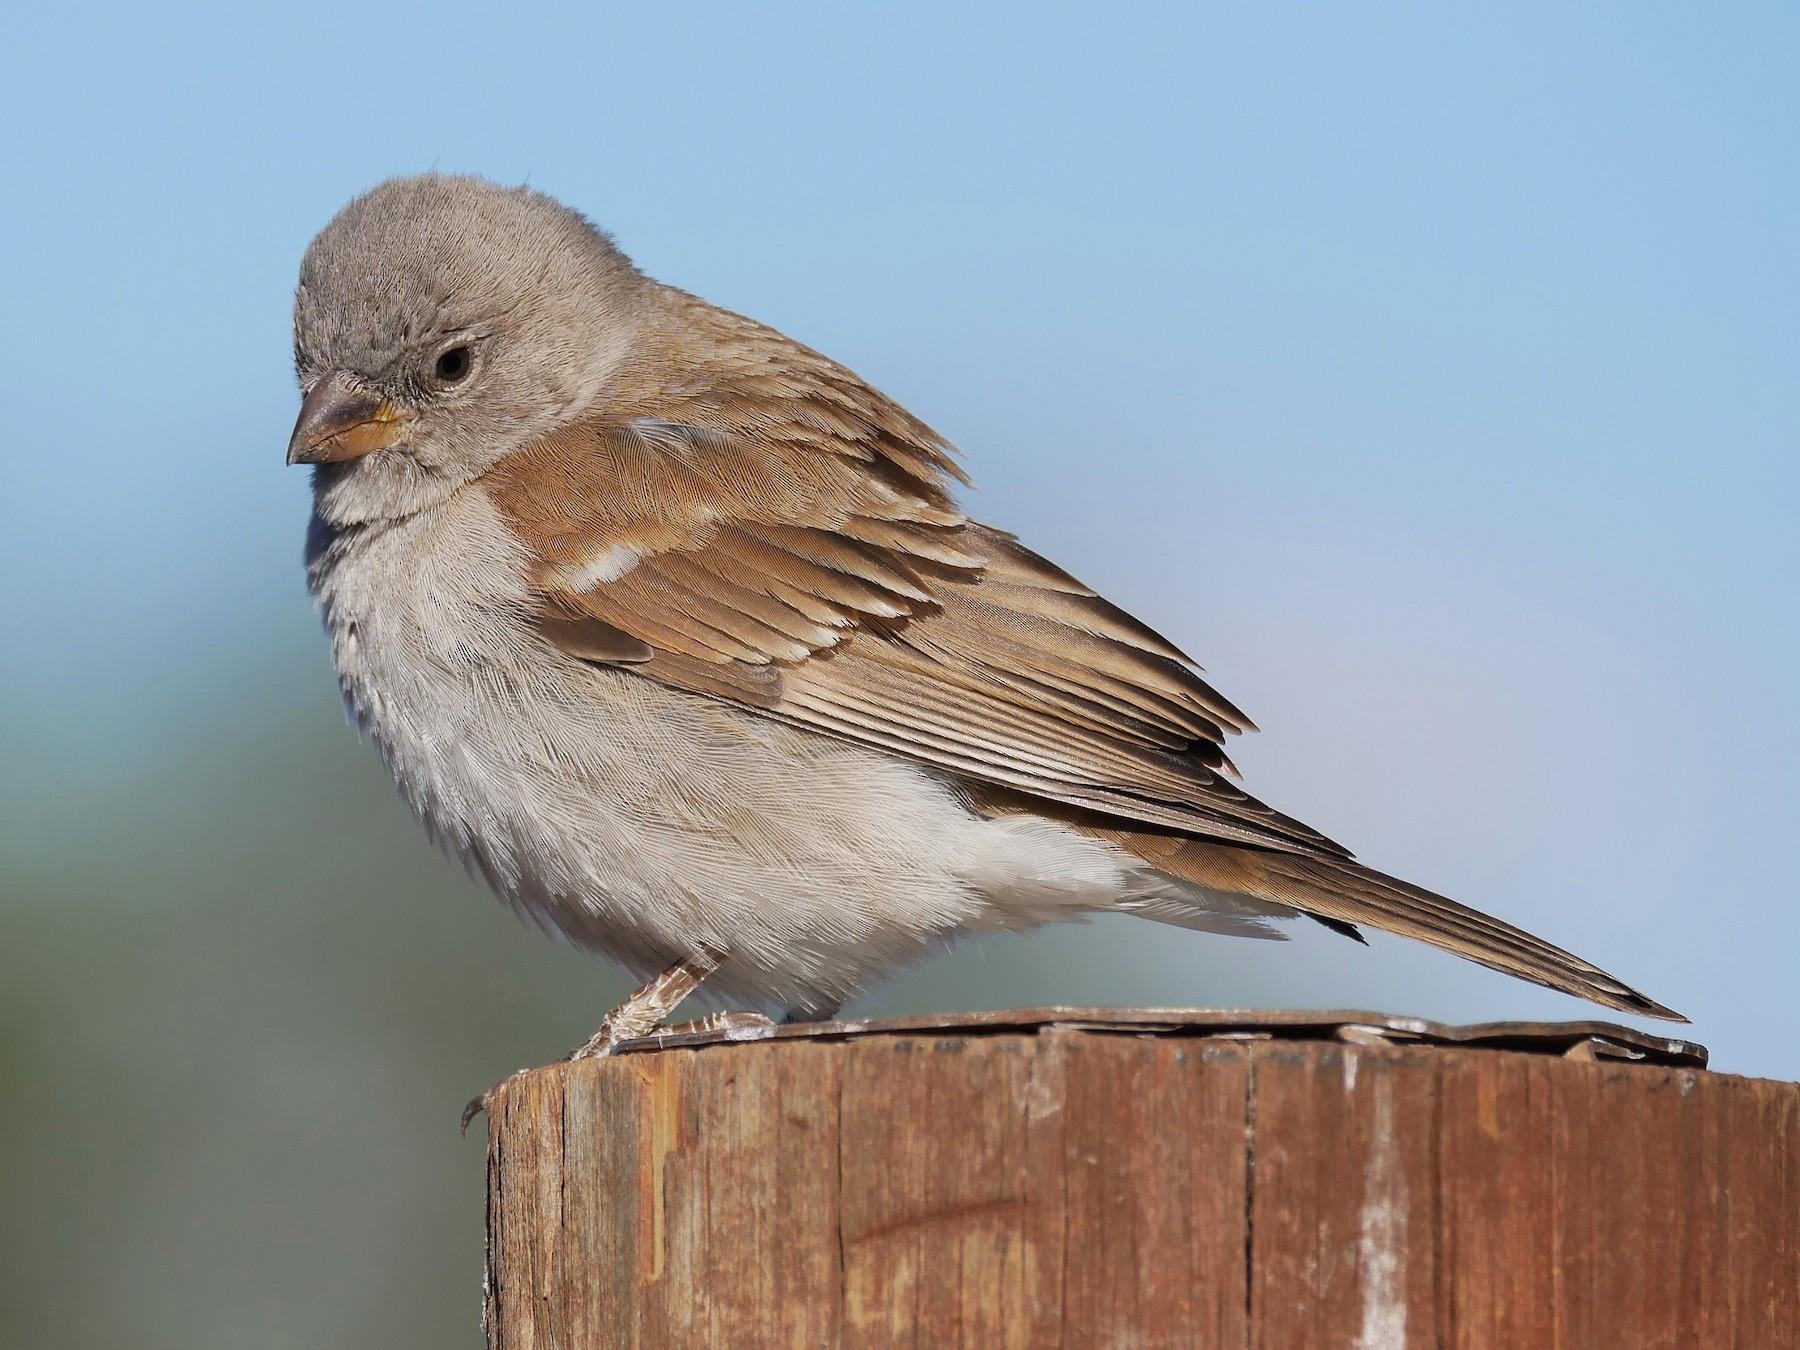 Southern Gray-headed Sparrow - Tom Heijnen